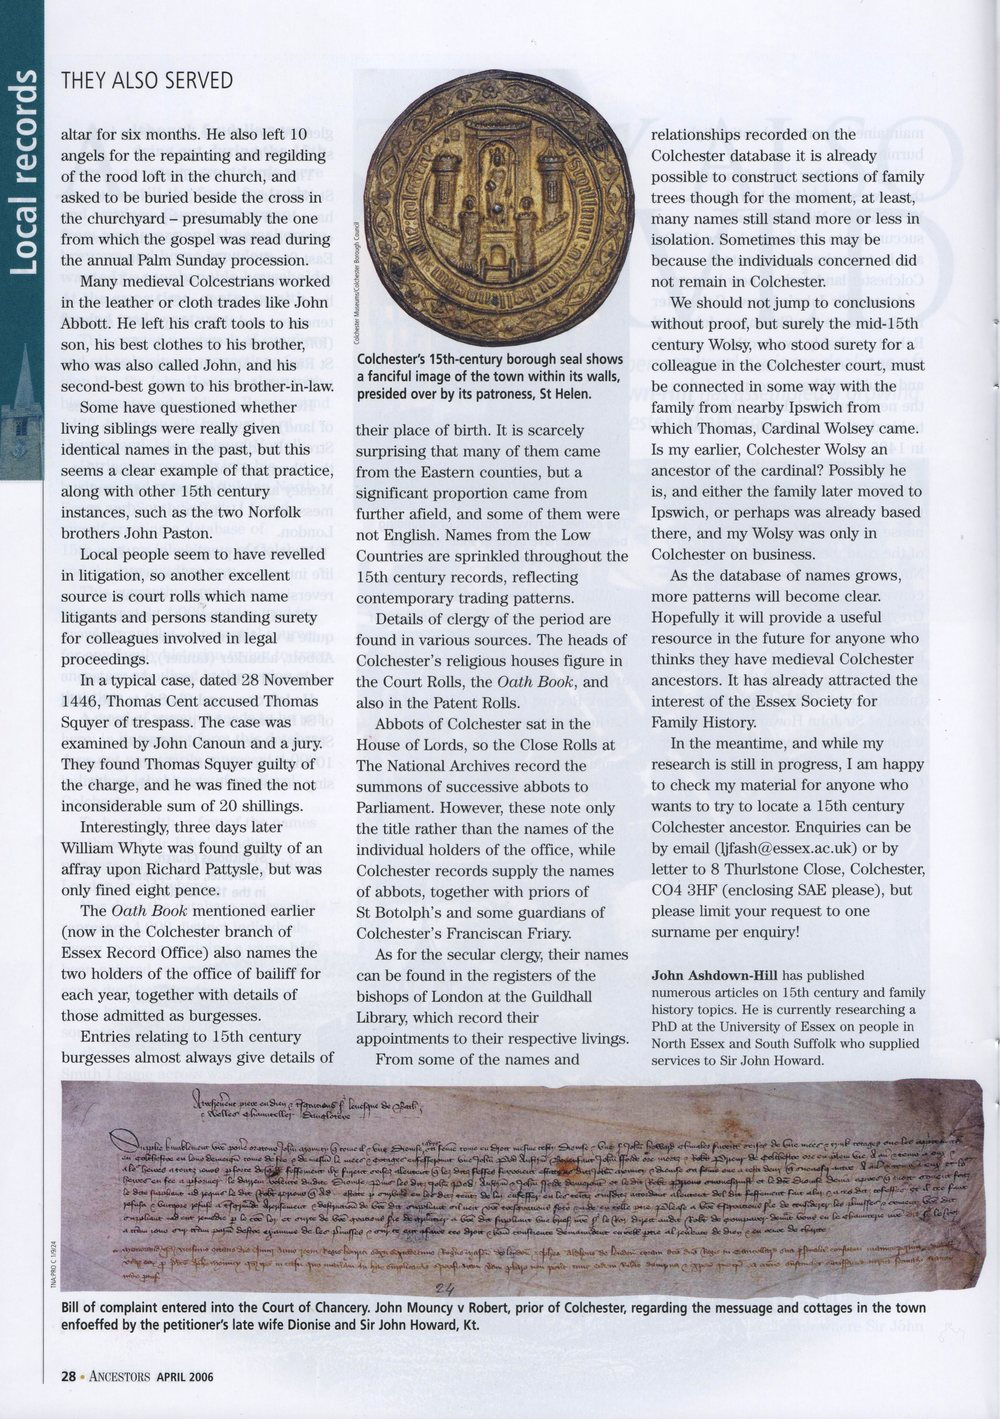 Ancestors magazine April 2006, p. 28.jpg